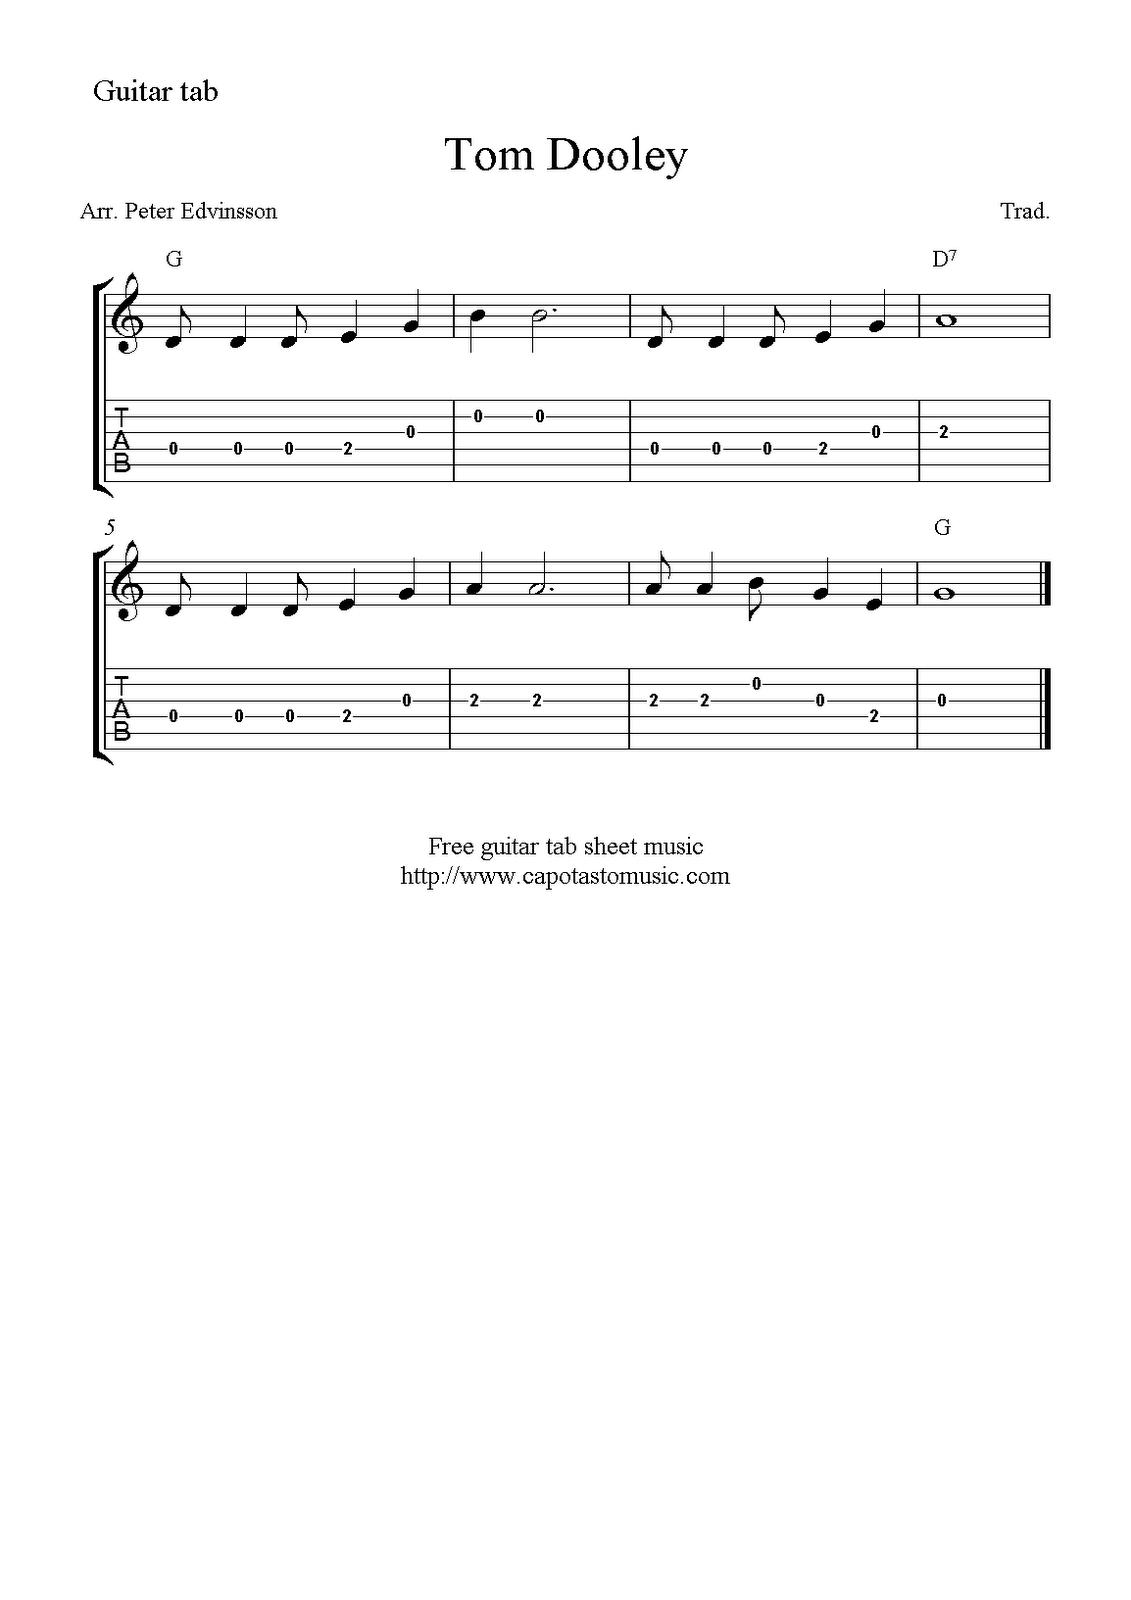 tom dooley easy free guitar tablature sheet music for beginners. Black Bedroom Furniture Sets. Home Design Ideas